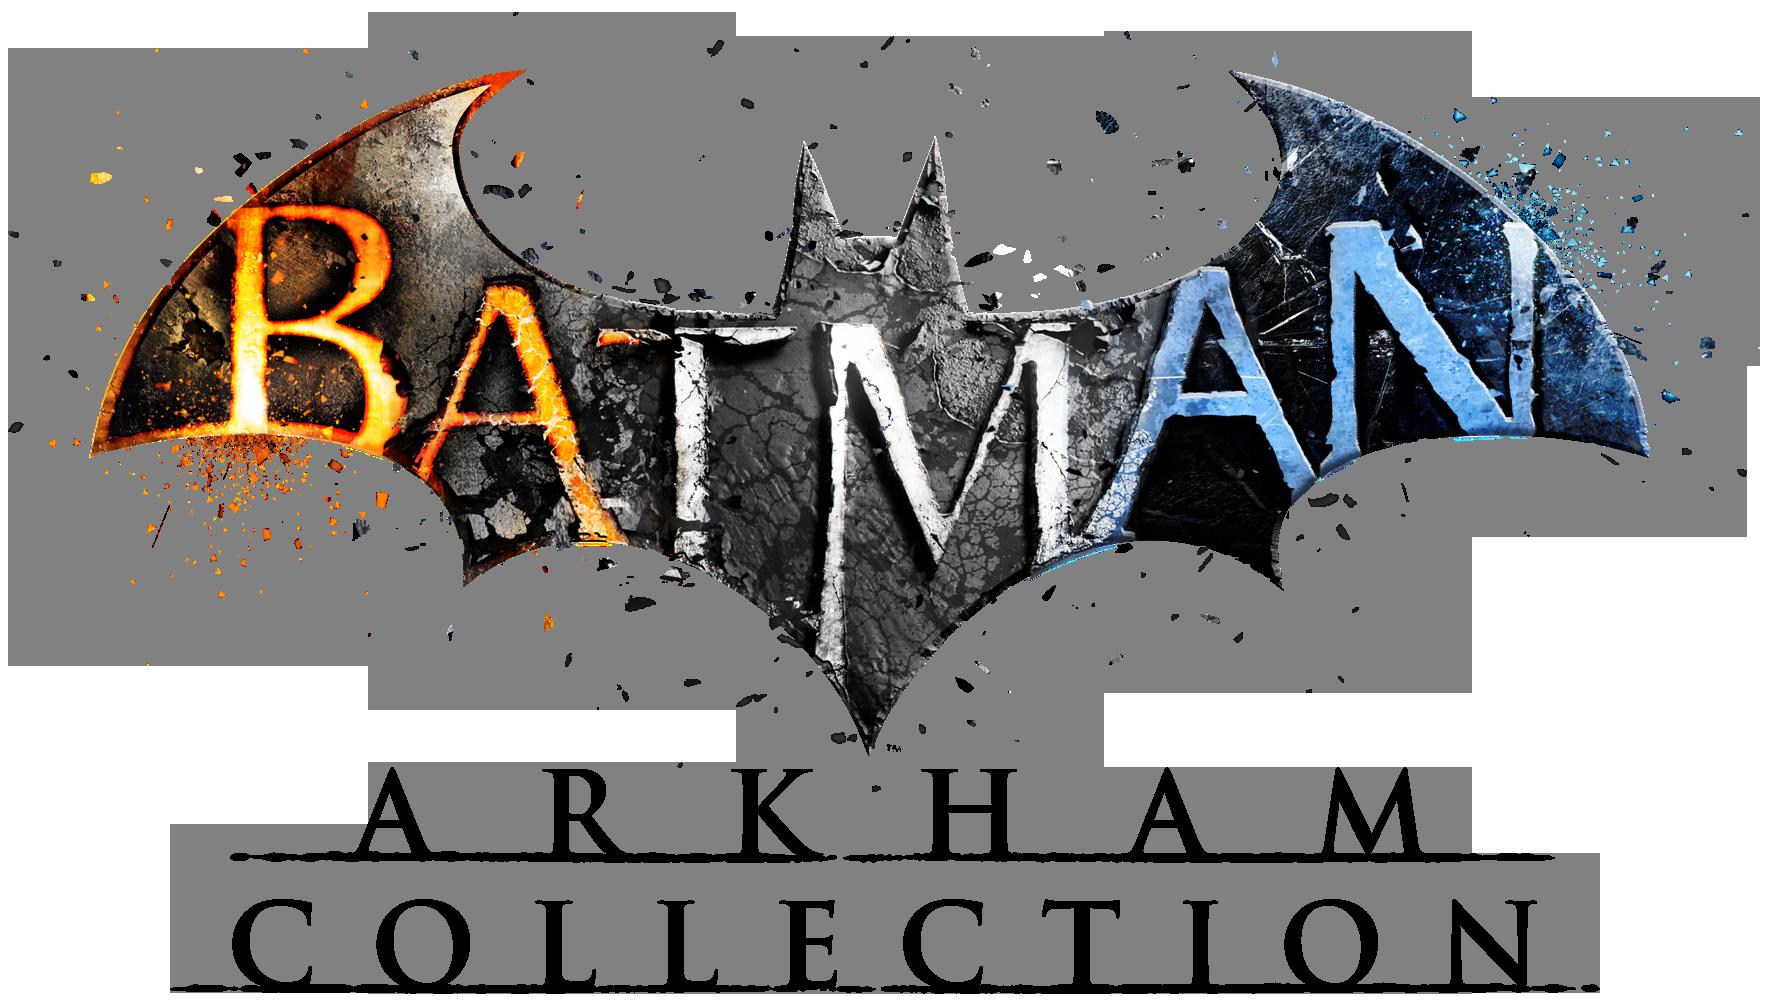 City Graphic Arkham Batman Brand Design Knight Olahraga